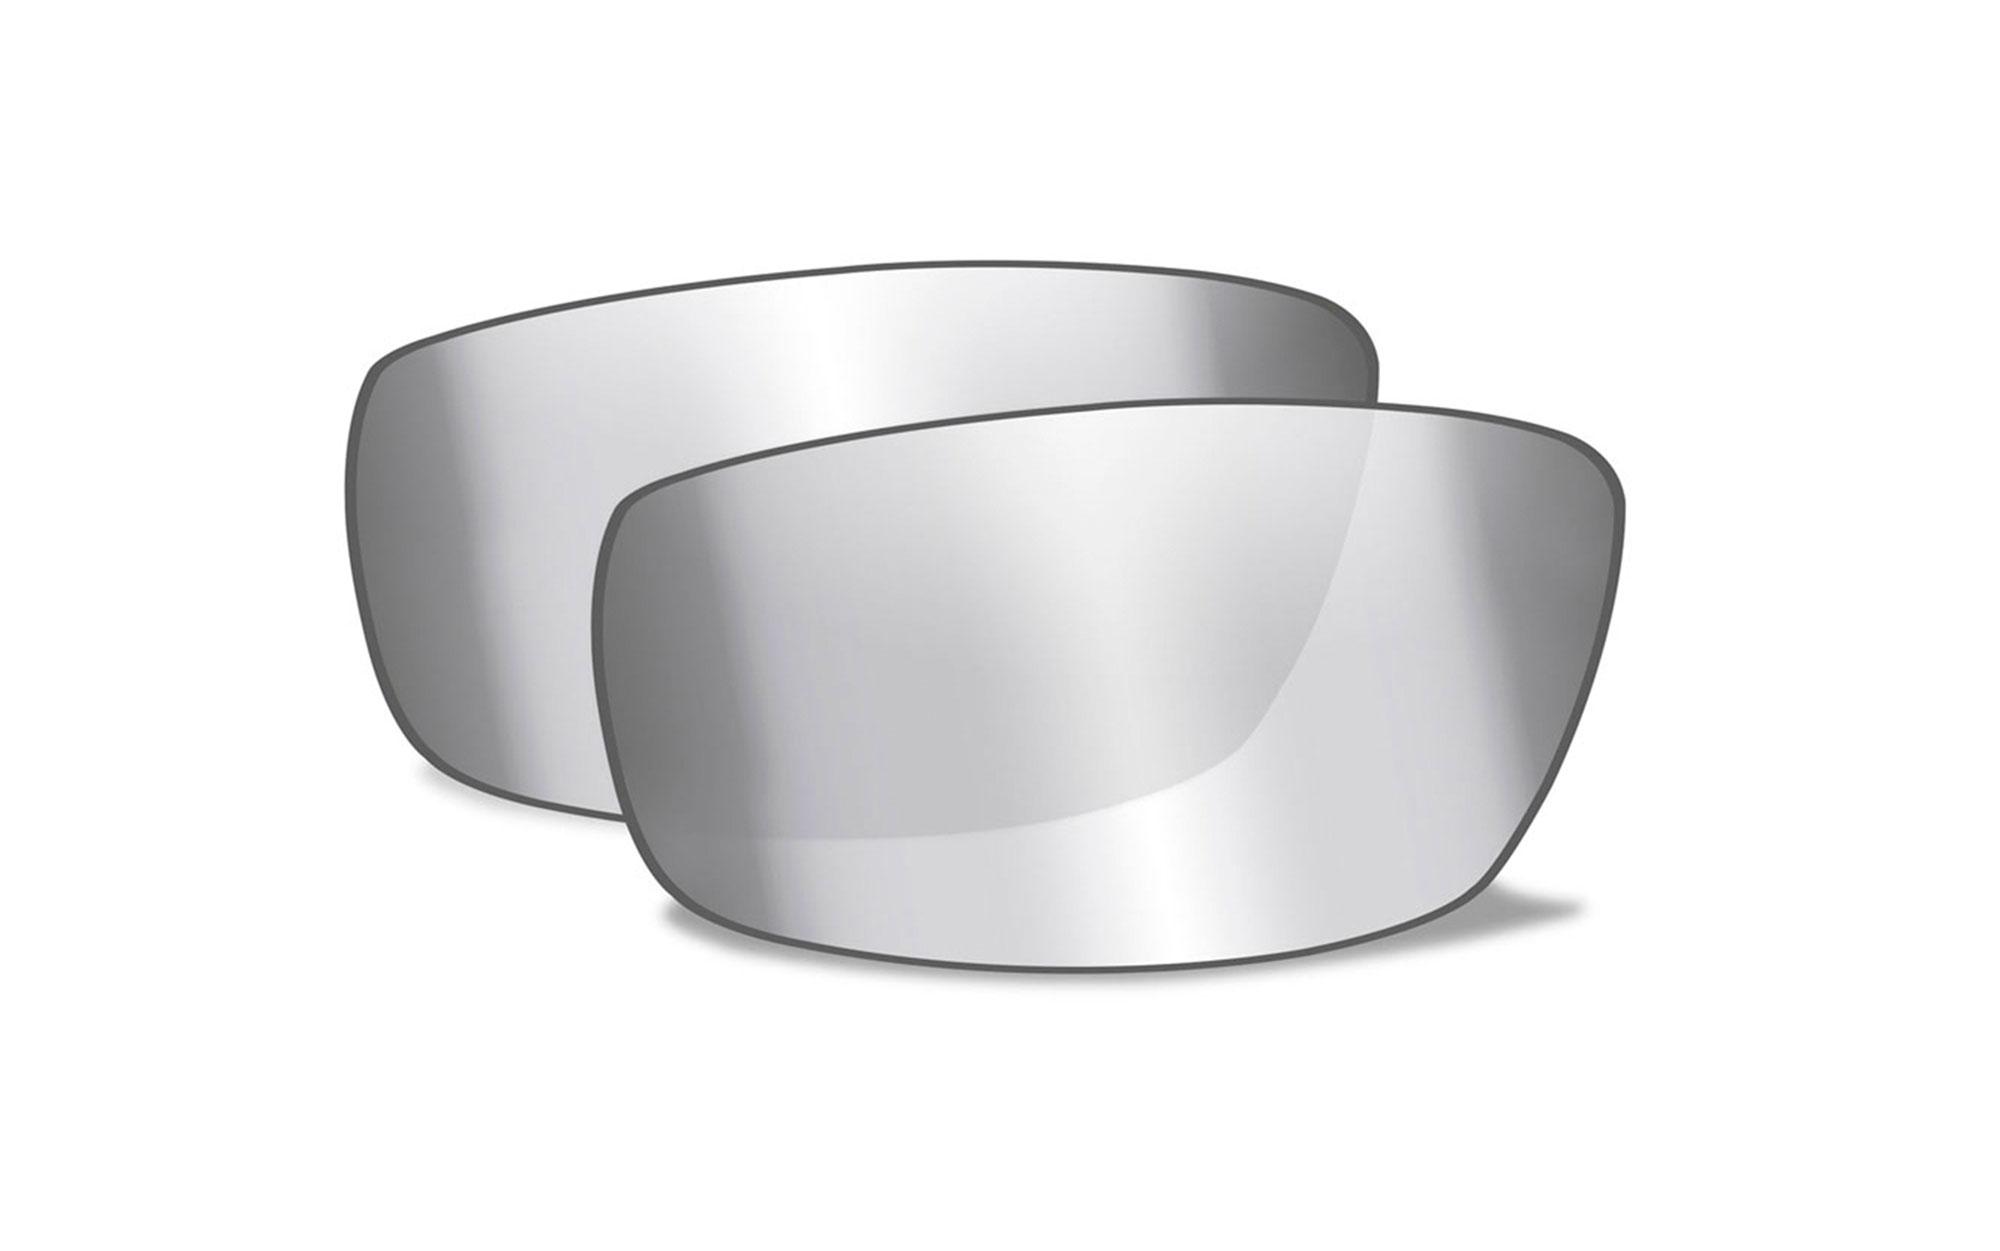 WX Kobe Lenses Image